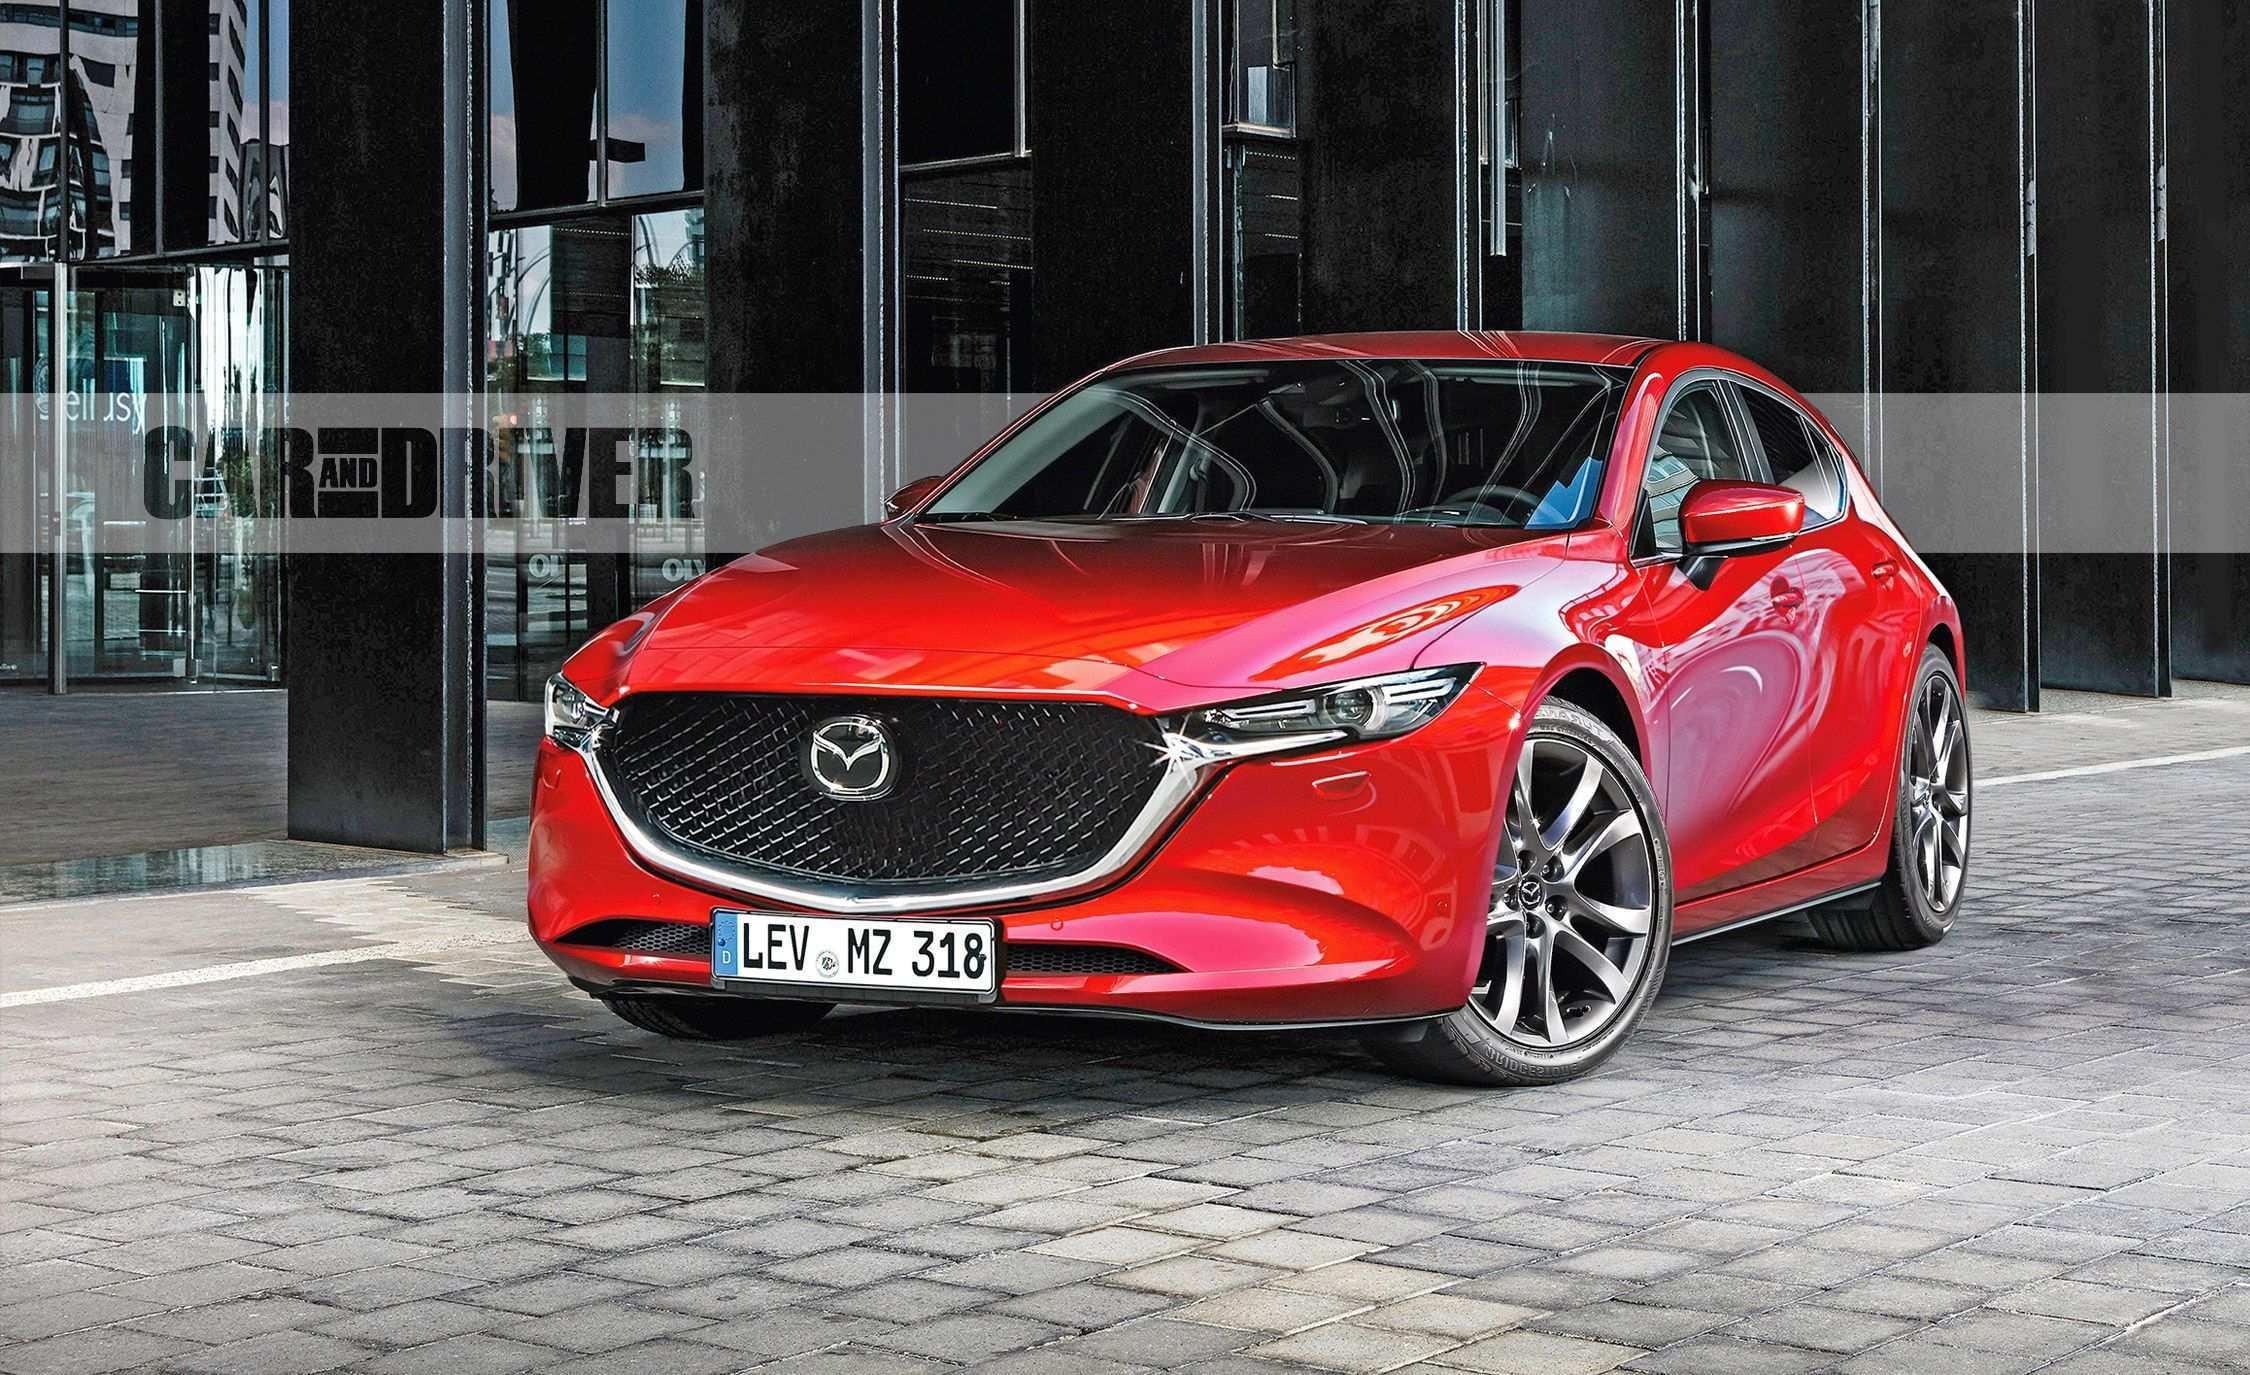 20 All New Mazda New Exterior 2020 Rumors for Mazda New Exterior 2020